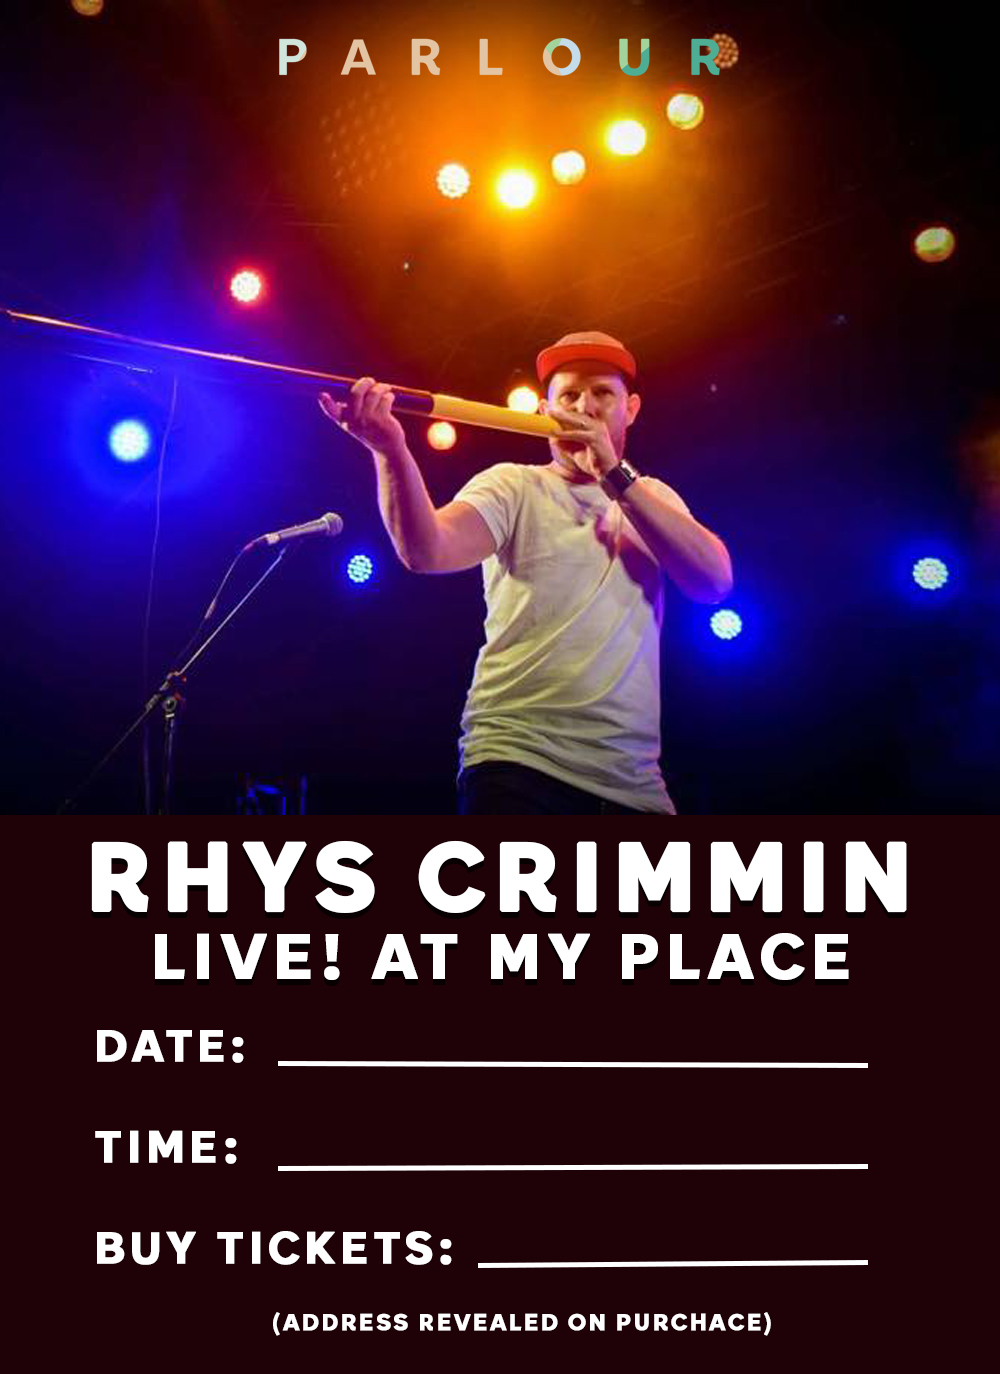 rhys crimmin poster.jpg